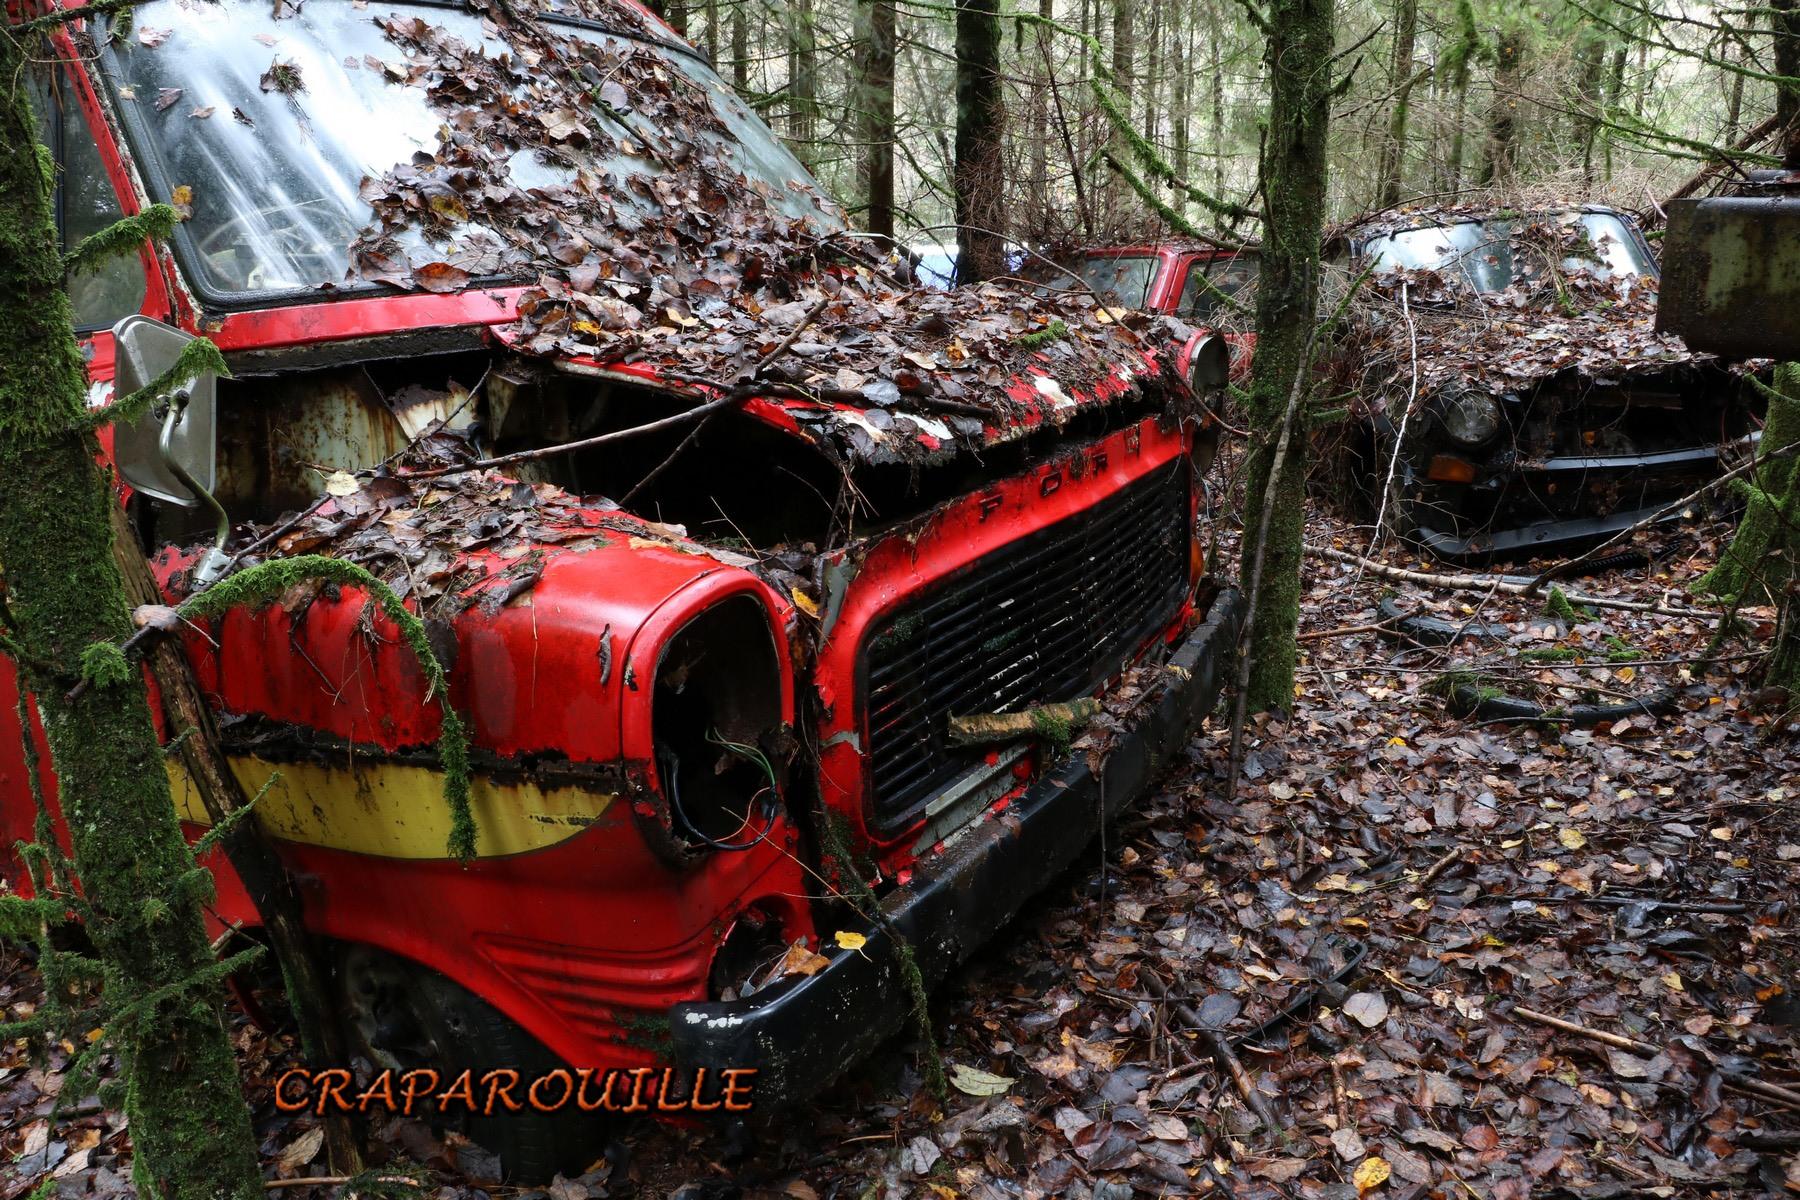 Le-Jardin-de-Crapa-Rouille-23